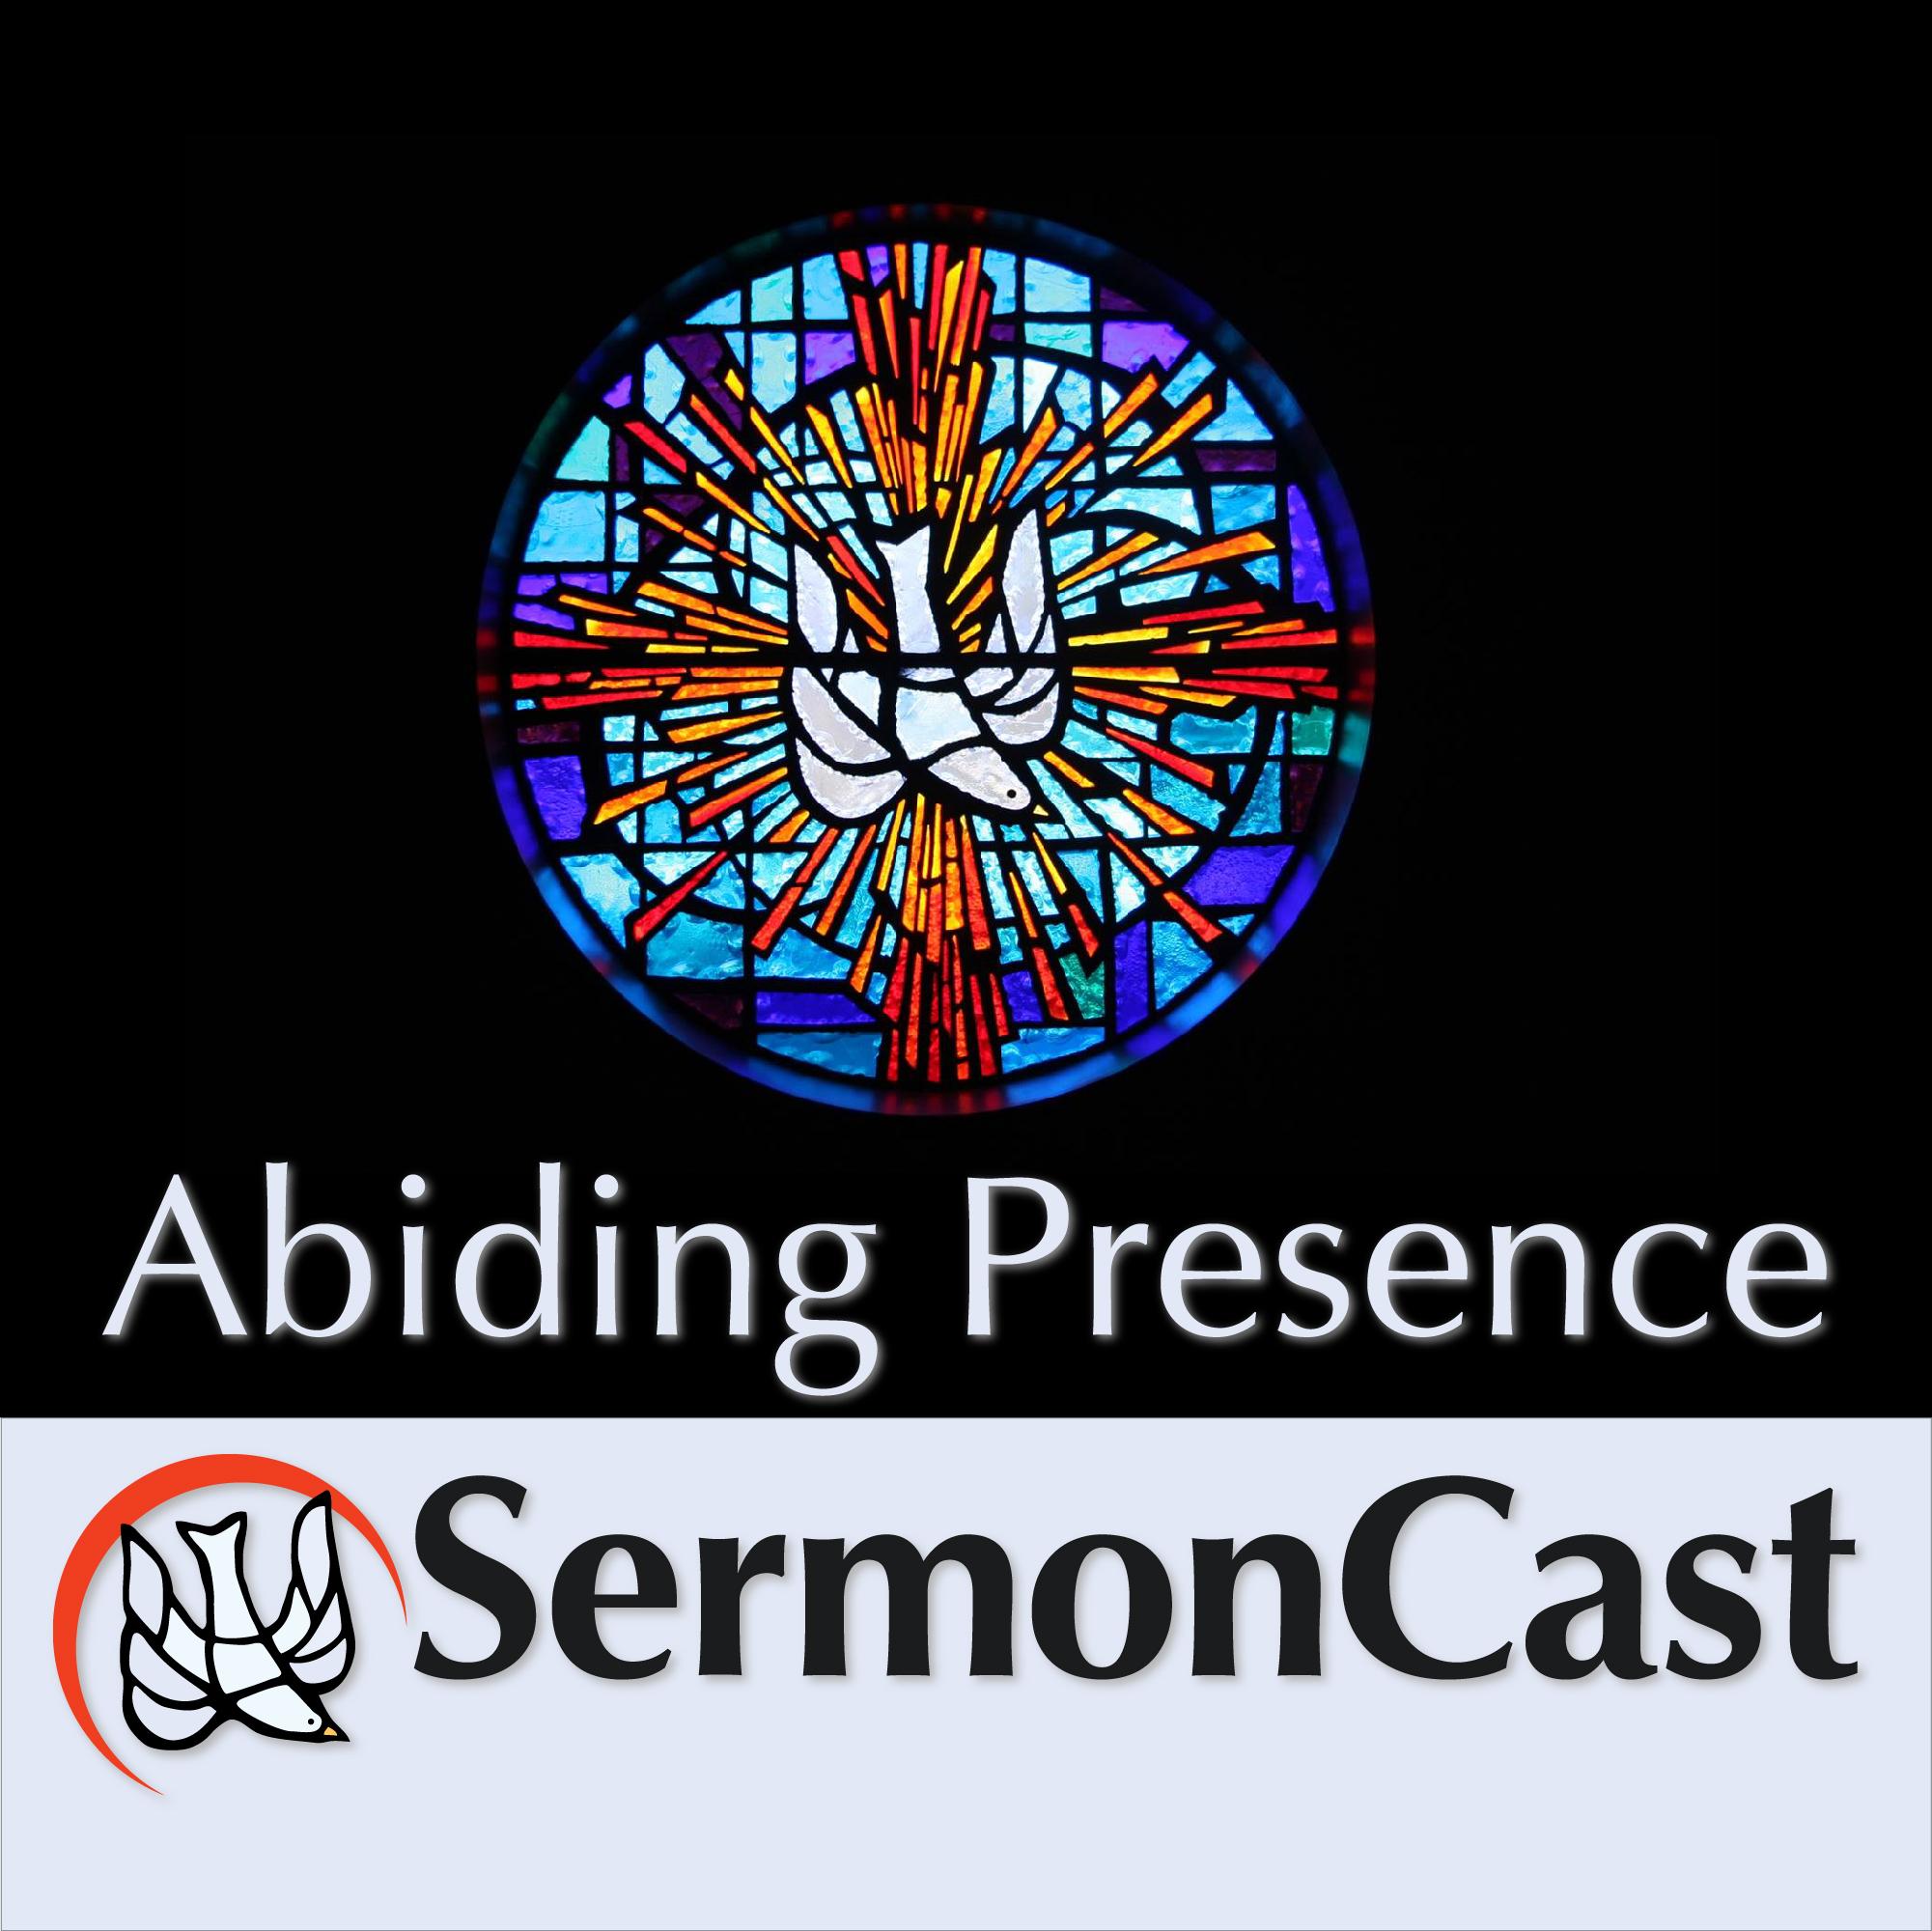 AP SermonCast Logo v3.jpg